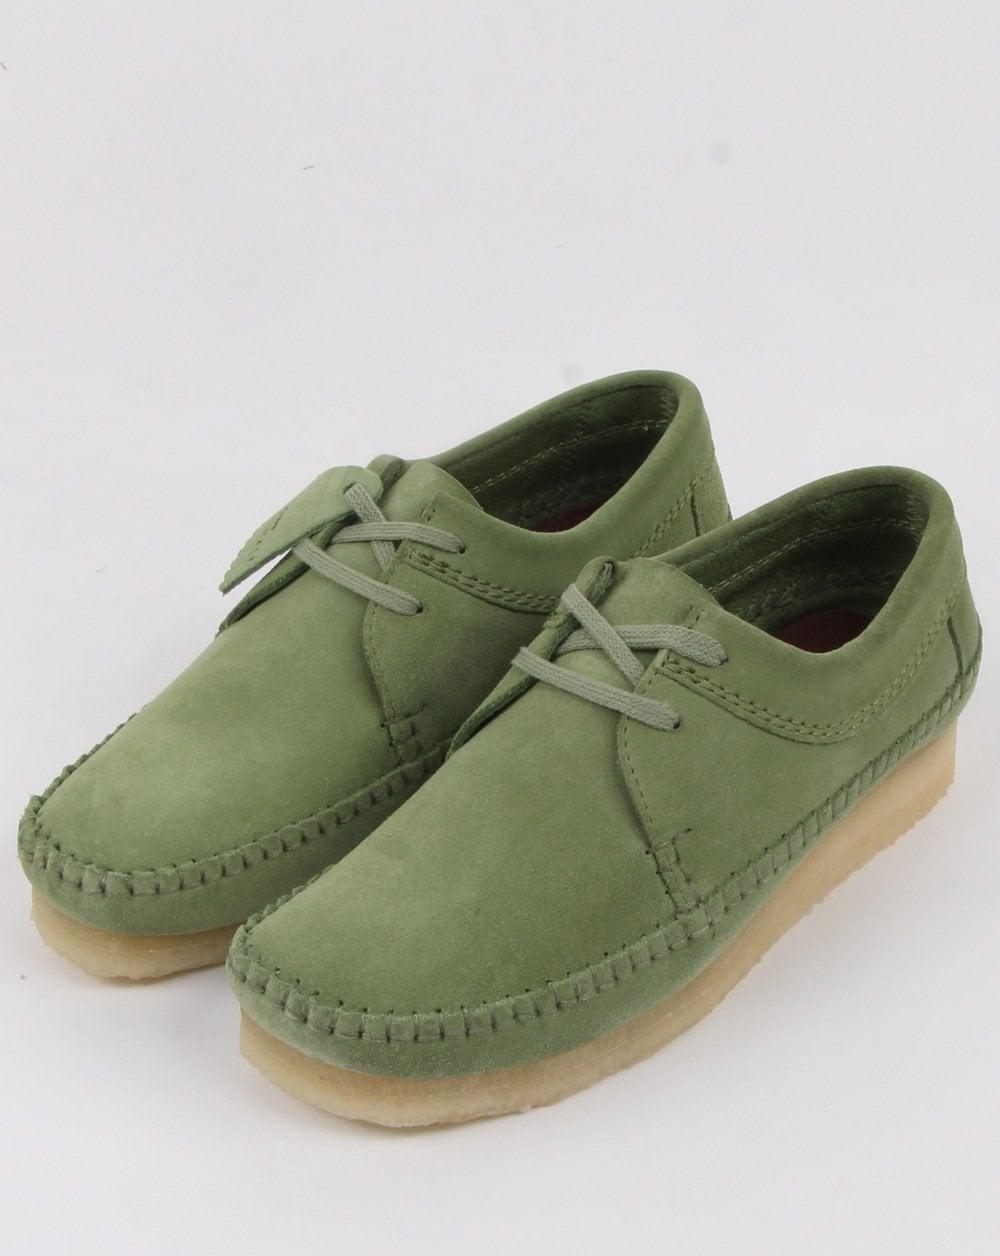 20fb5bdbedb98 Clarks Originals Weaver Shoes in Cactus Green, Mens, Footwear, Clarks